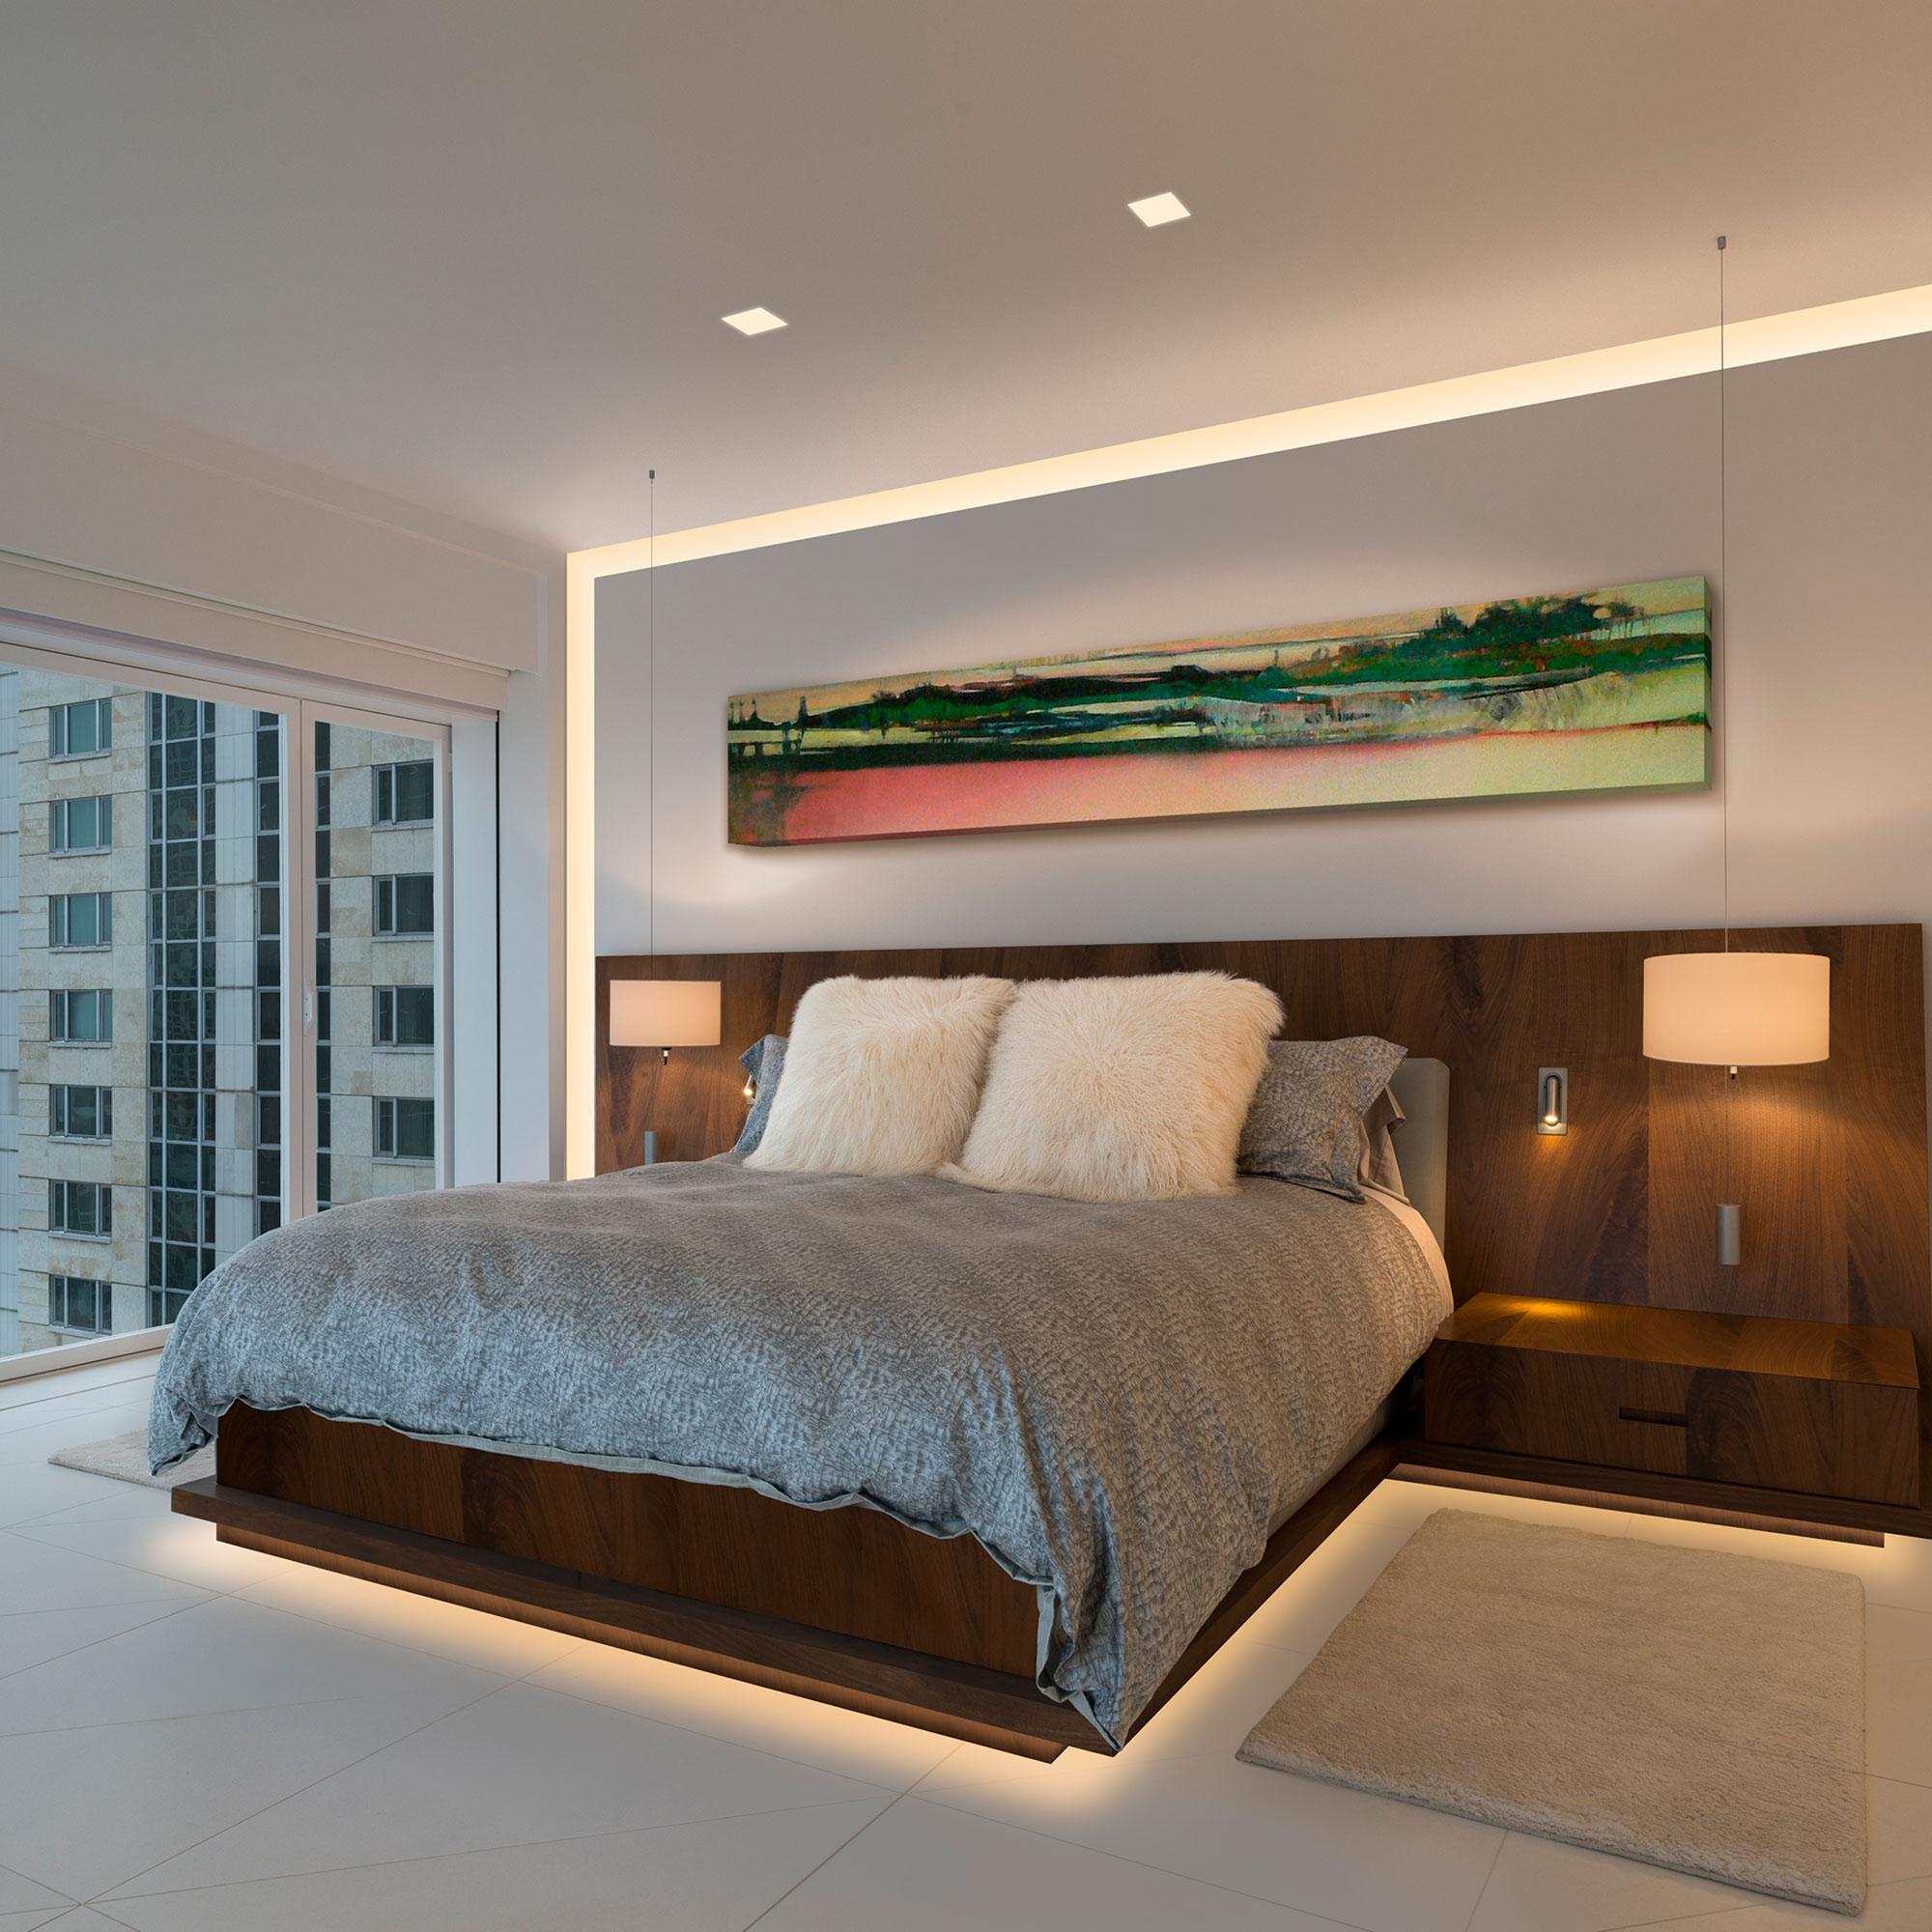 verge wall 5w 2k4k variable white plaster in system by pureedge lighting vg 5wdc 5ft 2k4k